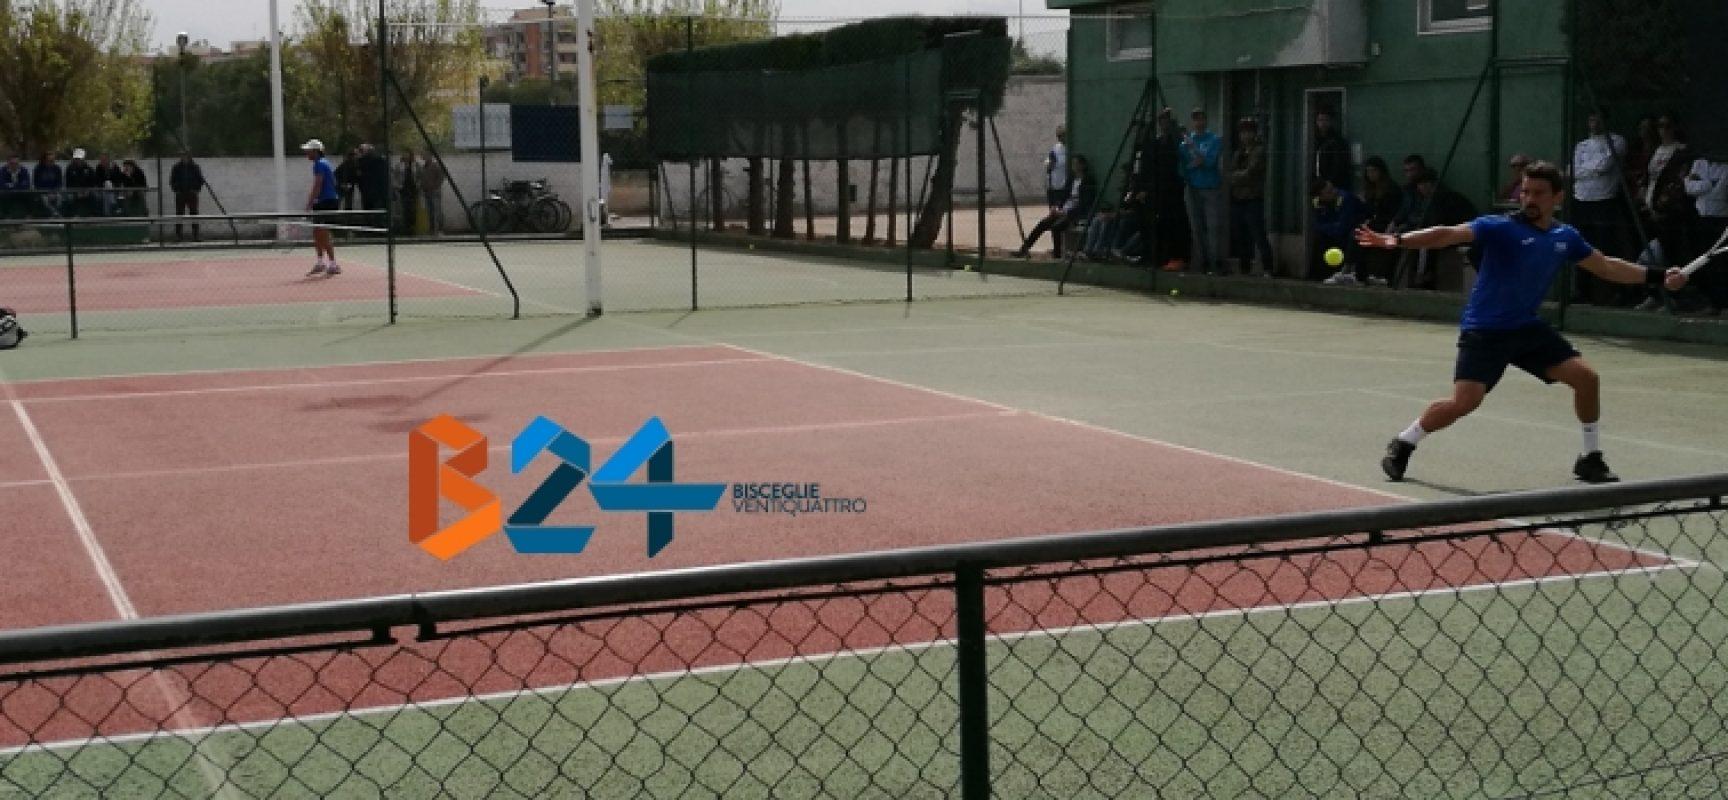 Tennis, Serie B: seconda vittoria consecutiva per lo Sporting Club Bisceglie